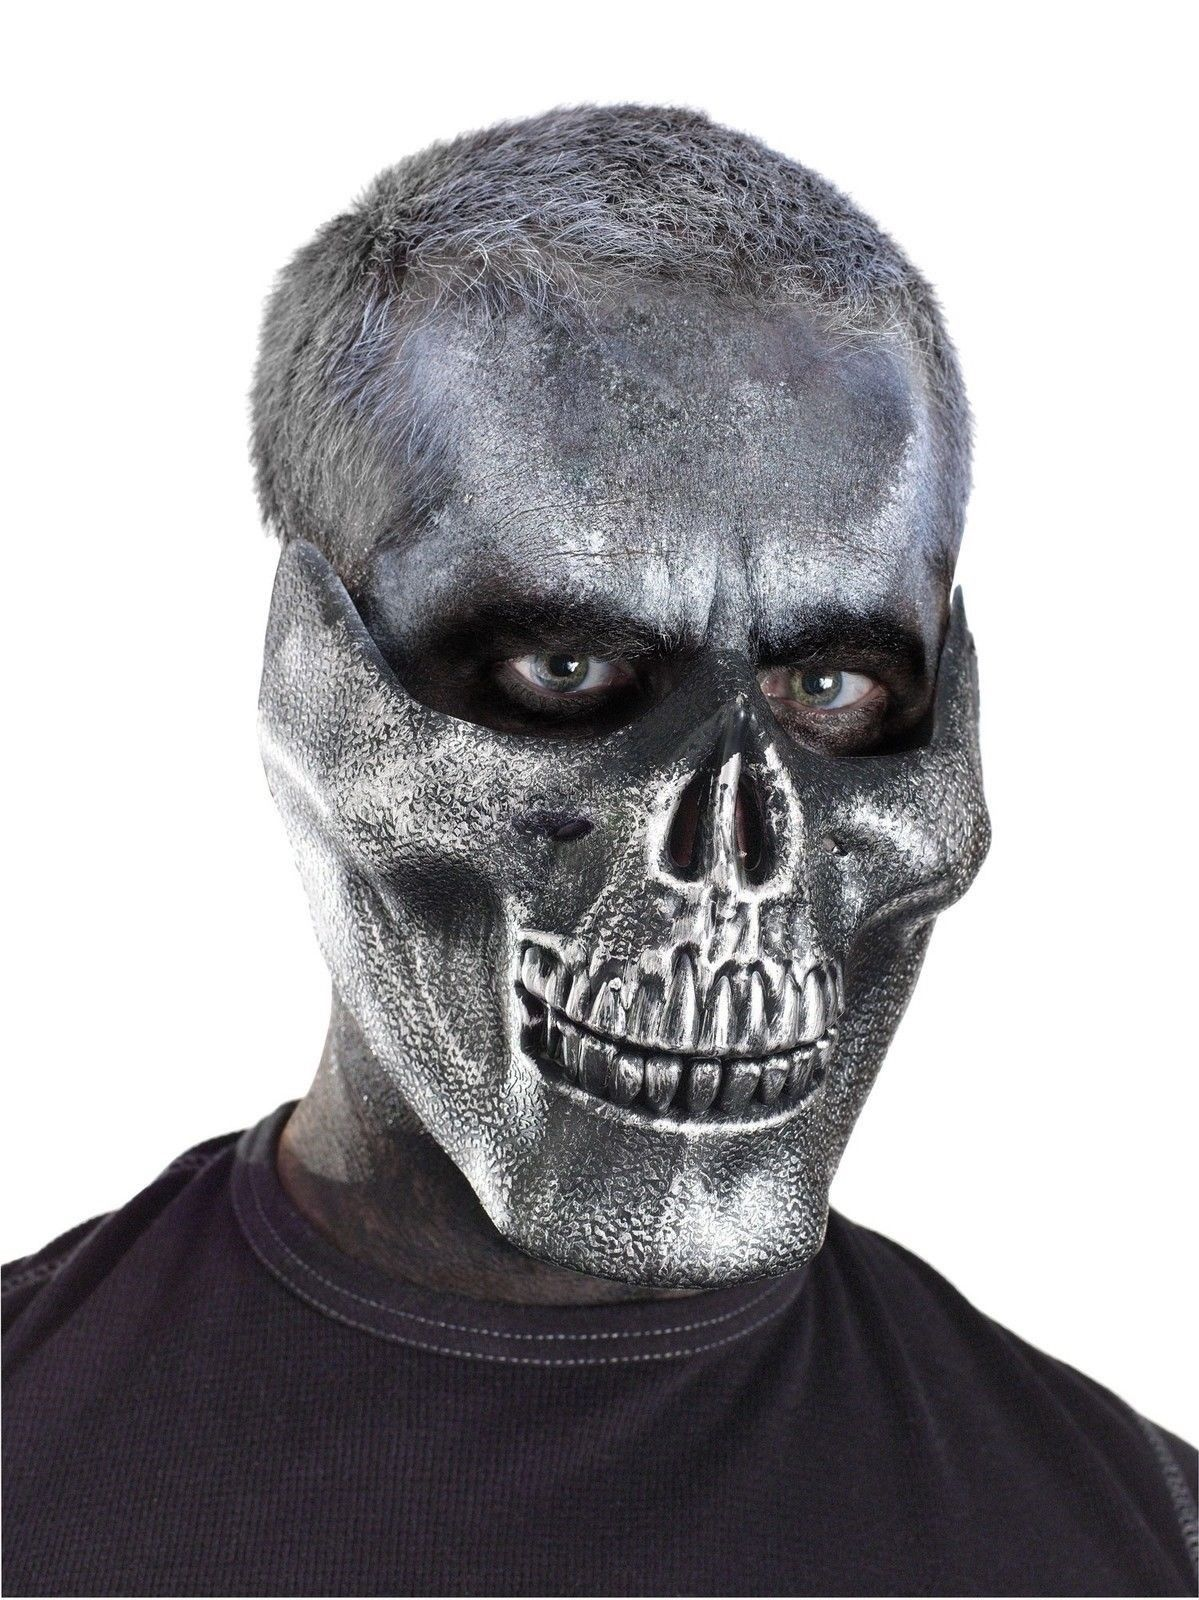 Human SKULL Moving Mouth Mask 2 Part SPFX Halloween Fancy Dress Costume Adult